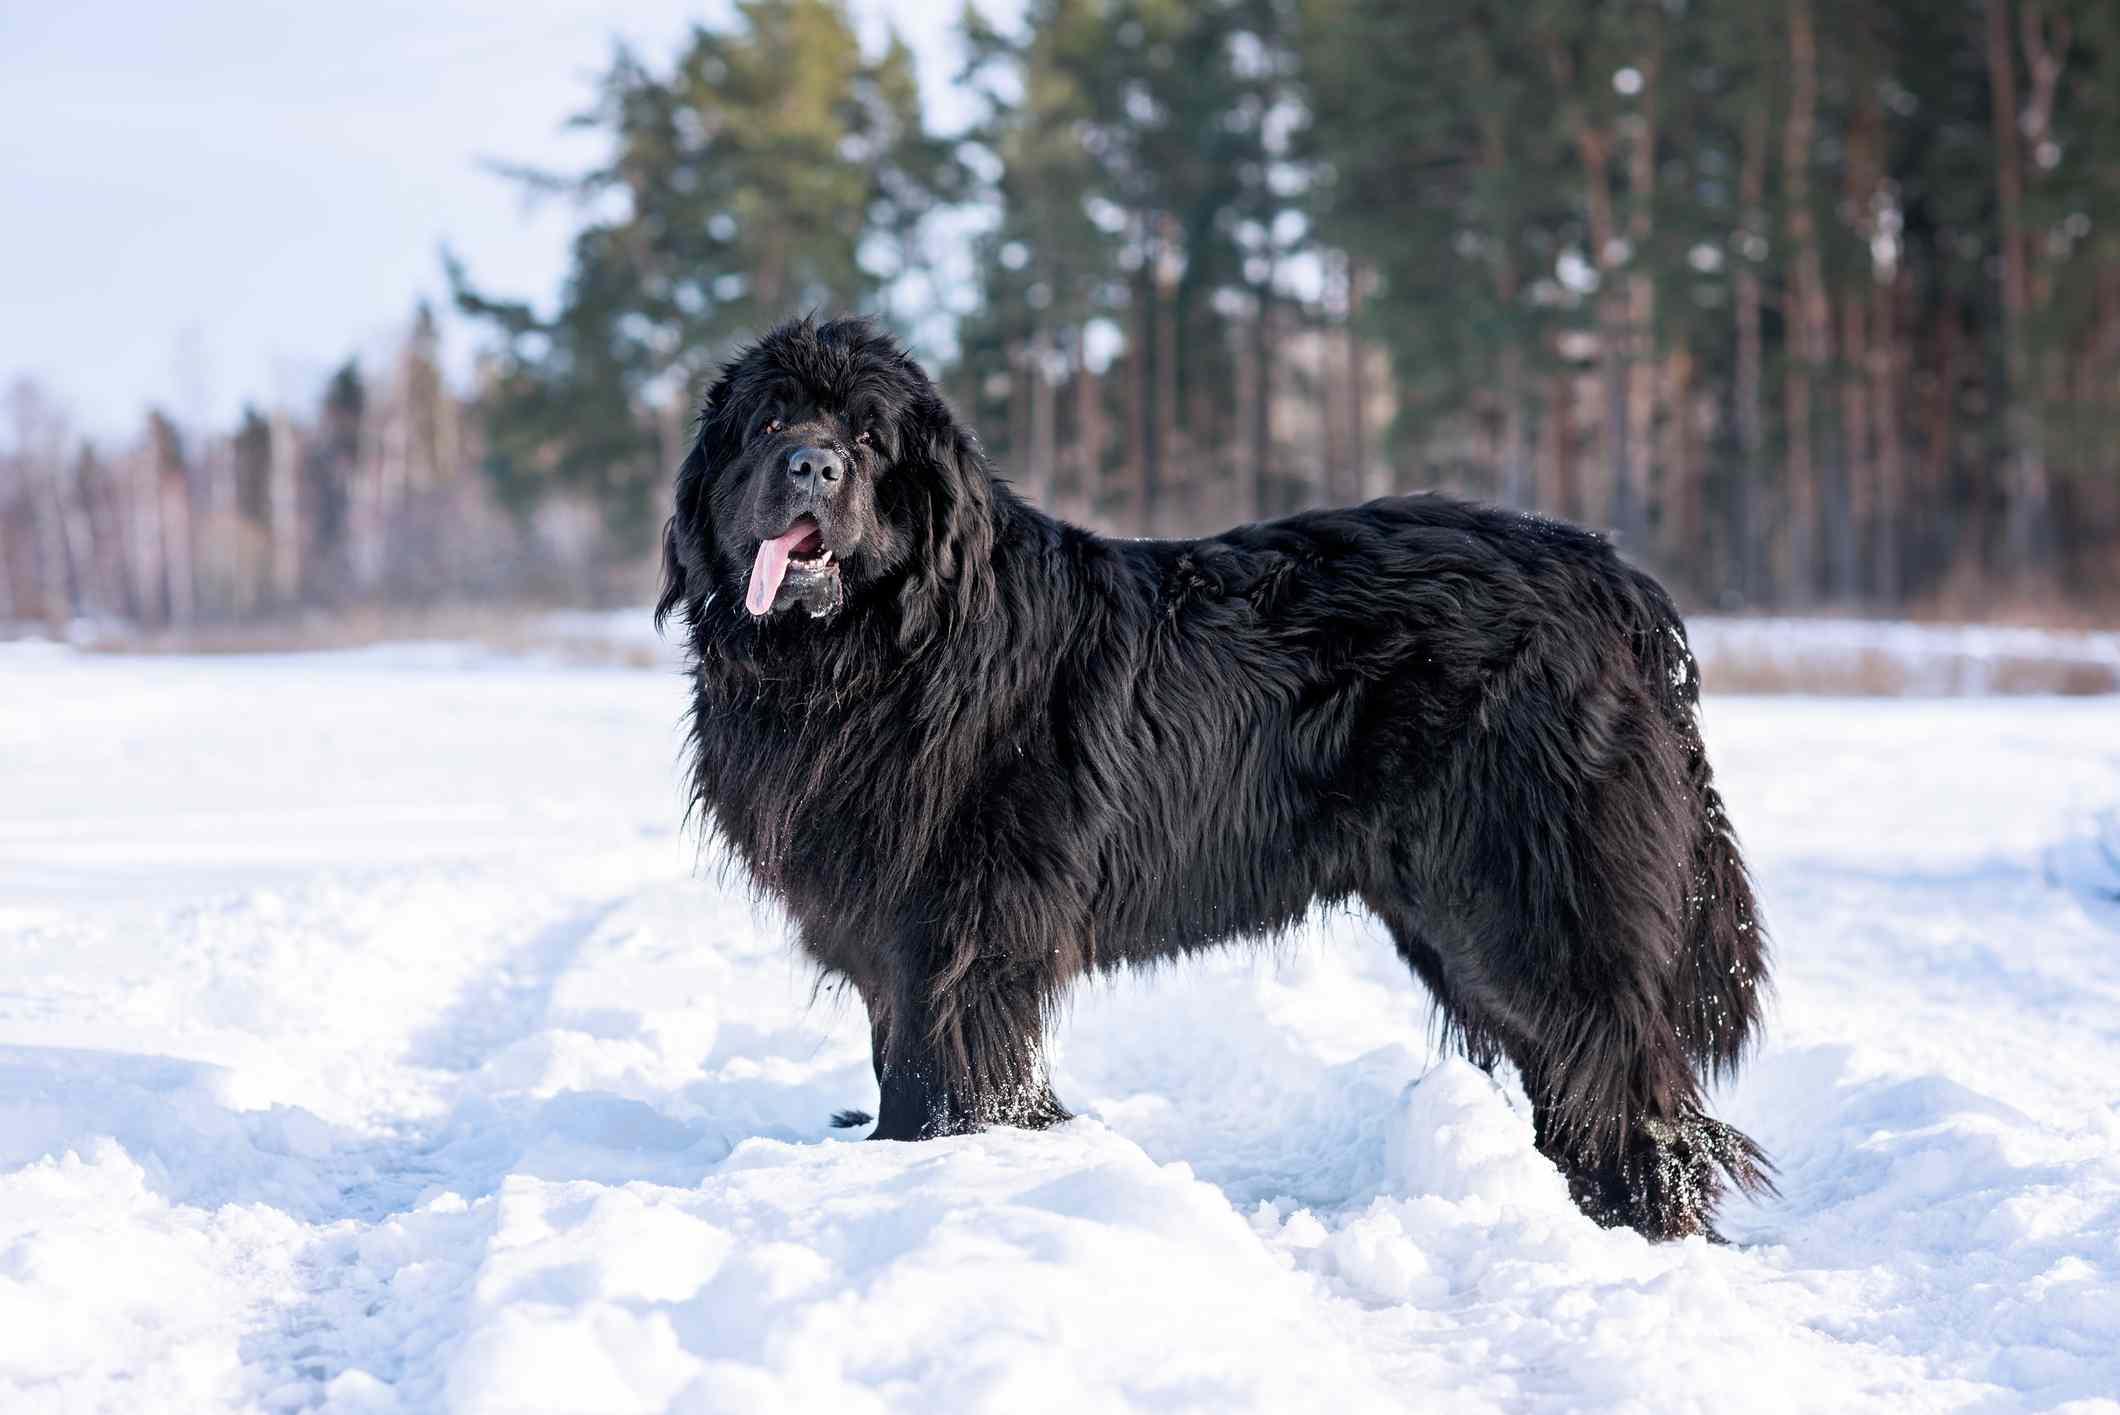 Black Newfoundland standing in snow